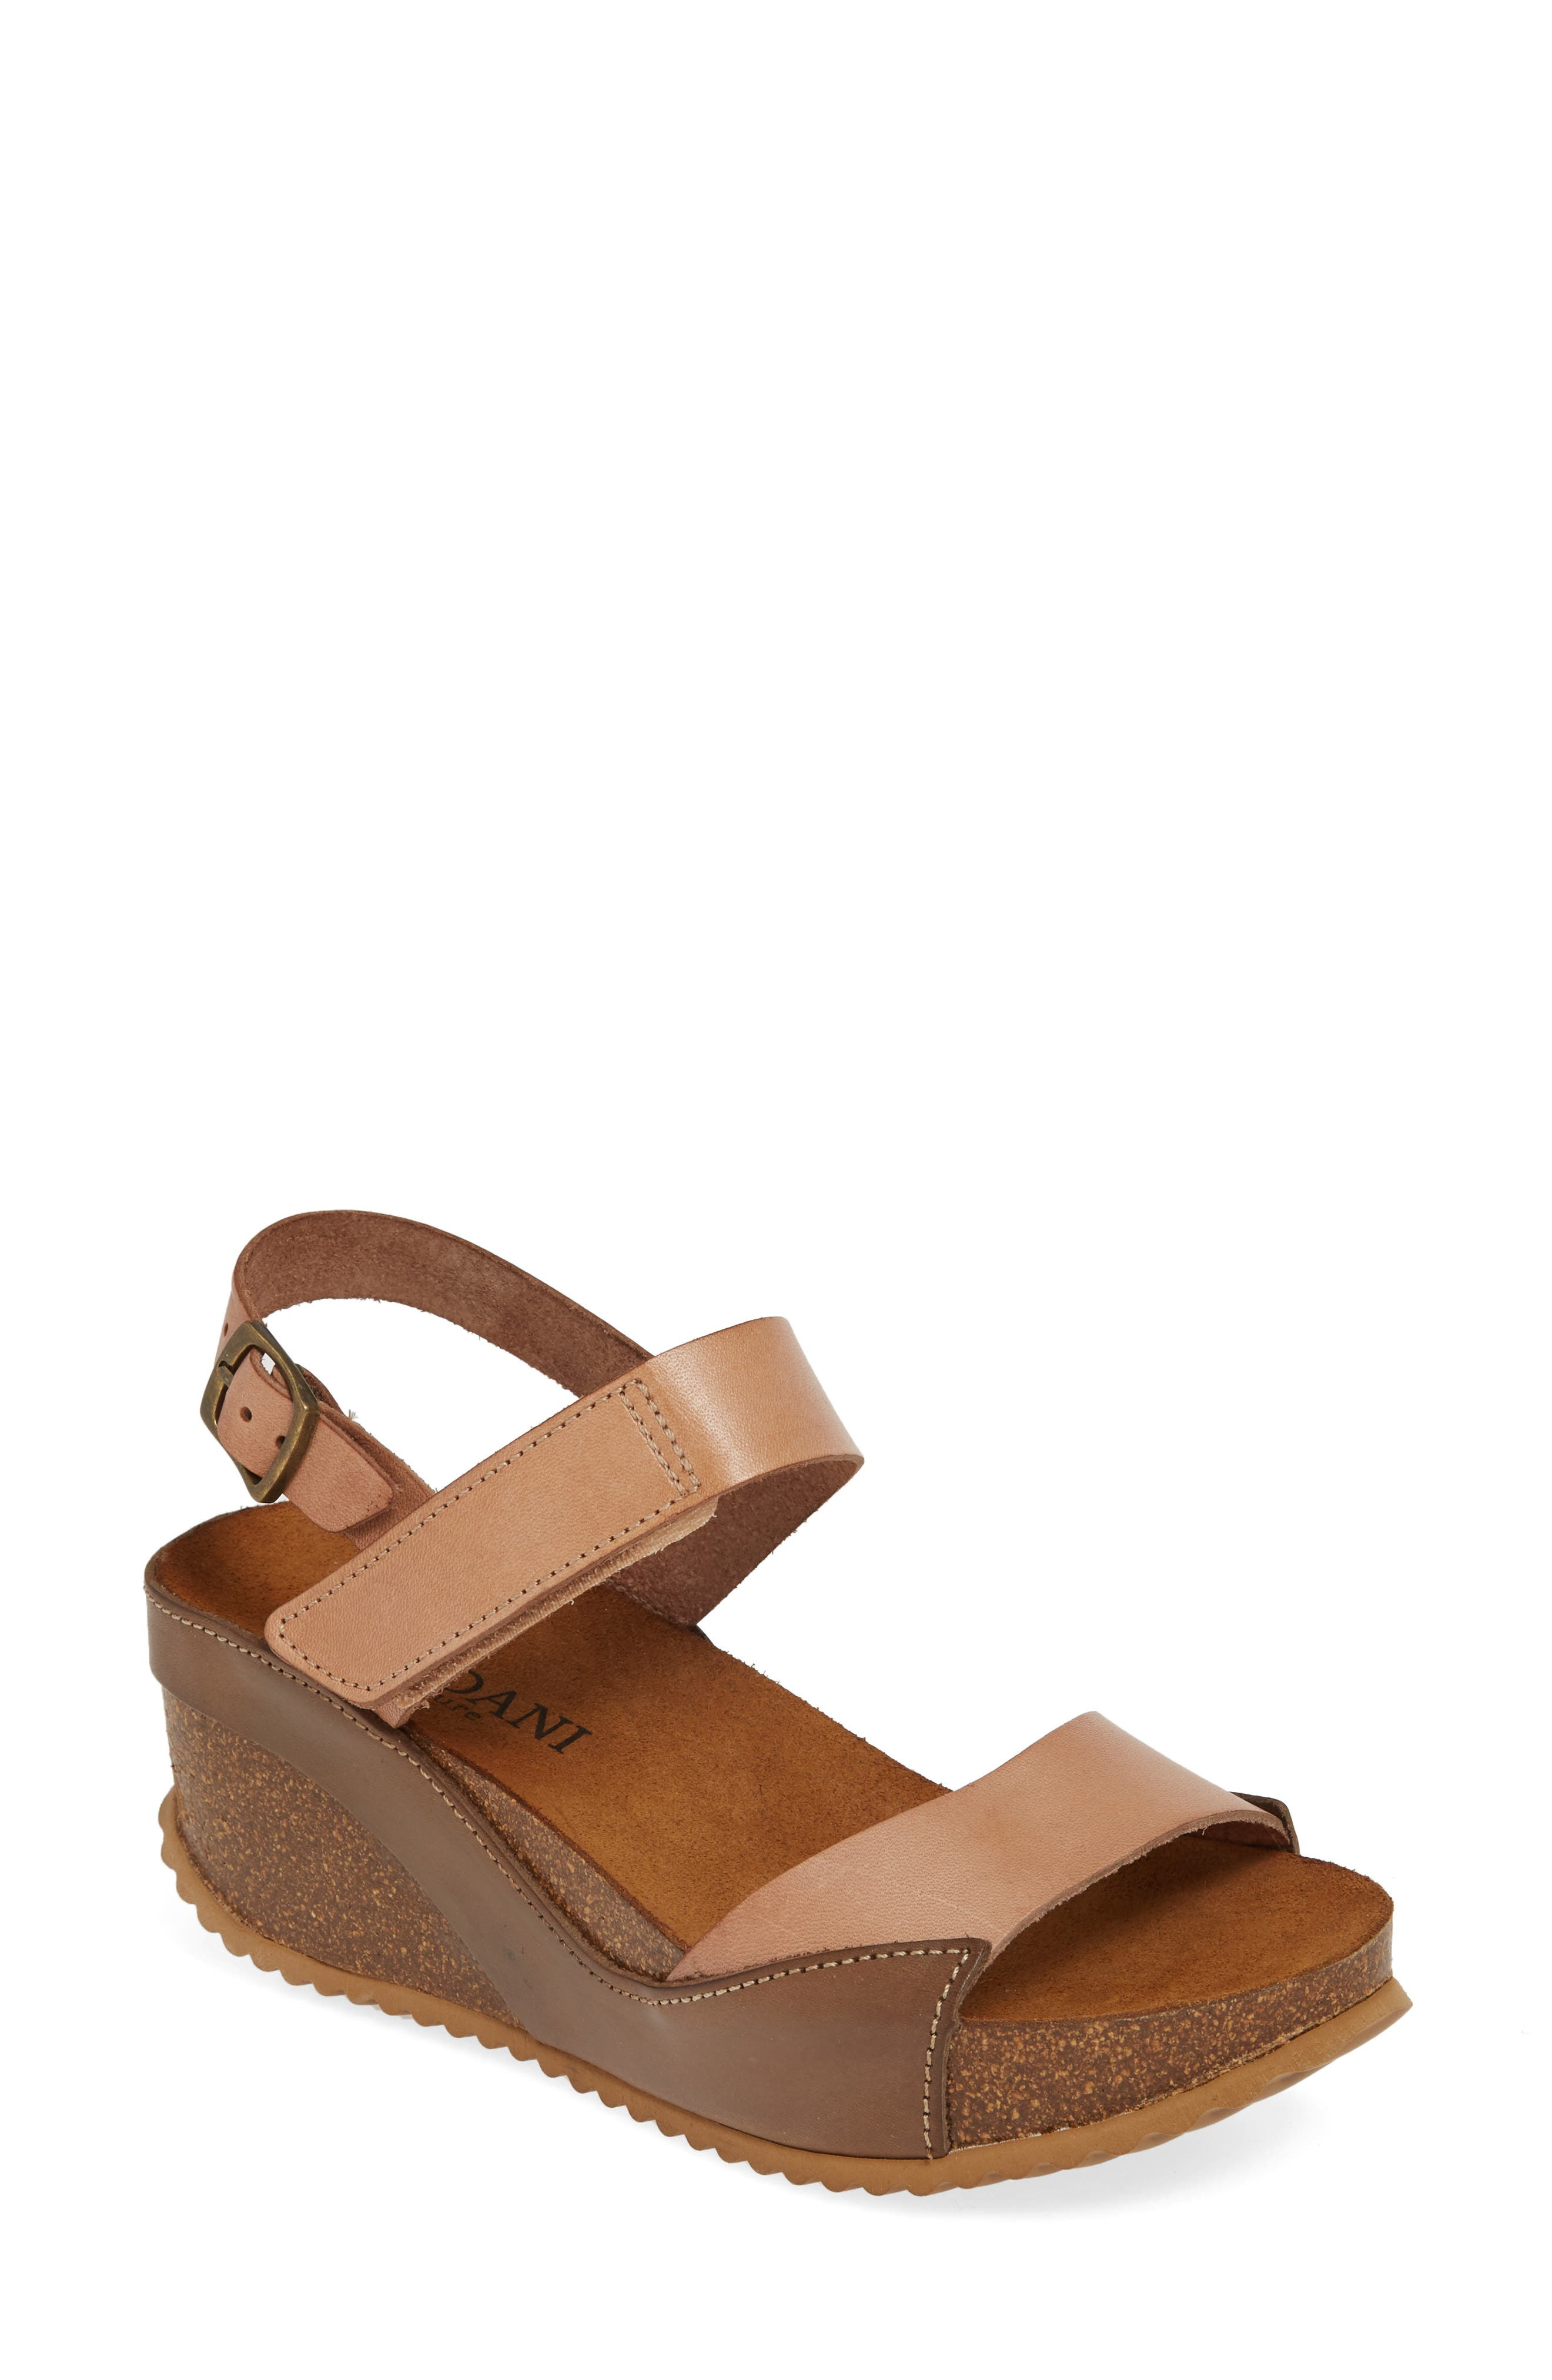 Cordani Marcelle Wedge Sandal, Brown